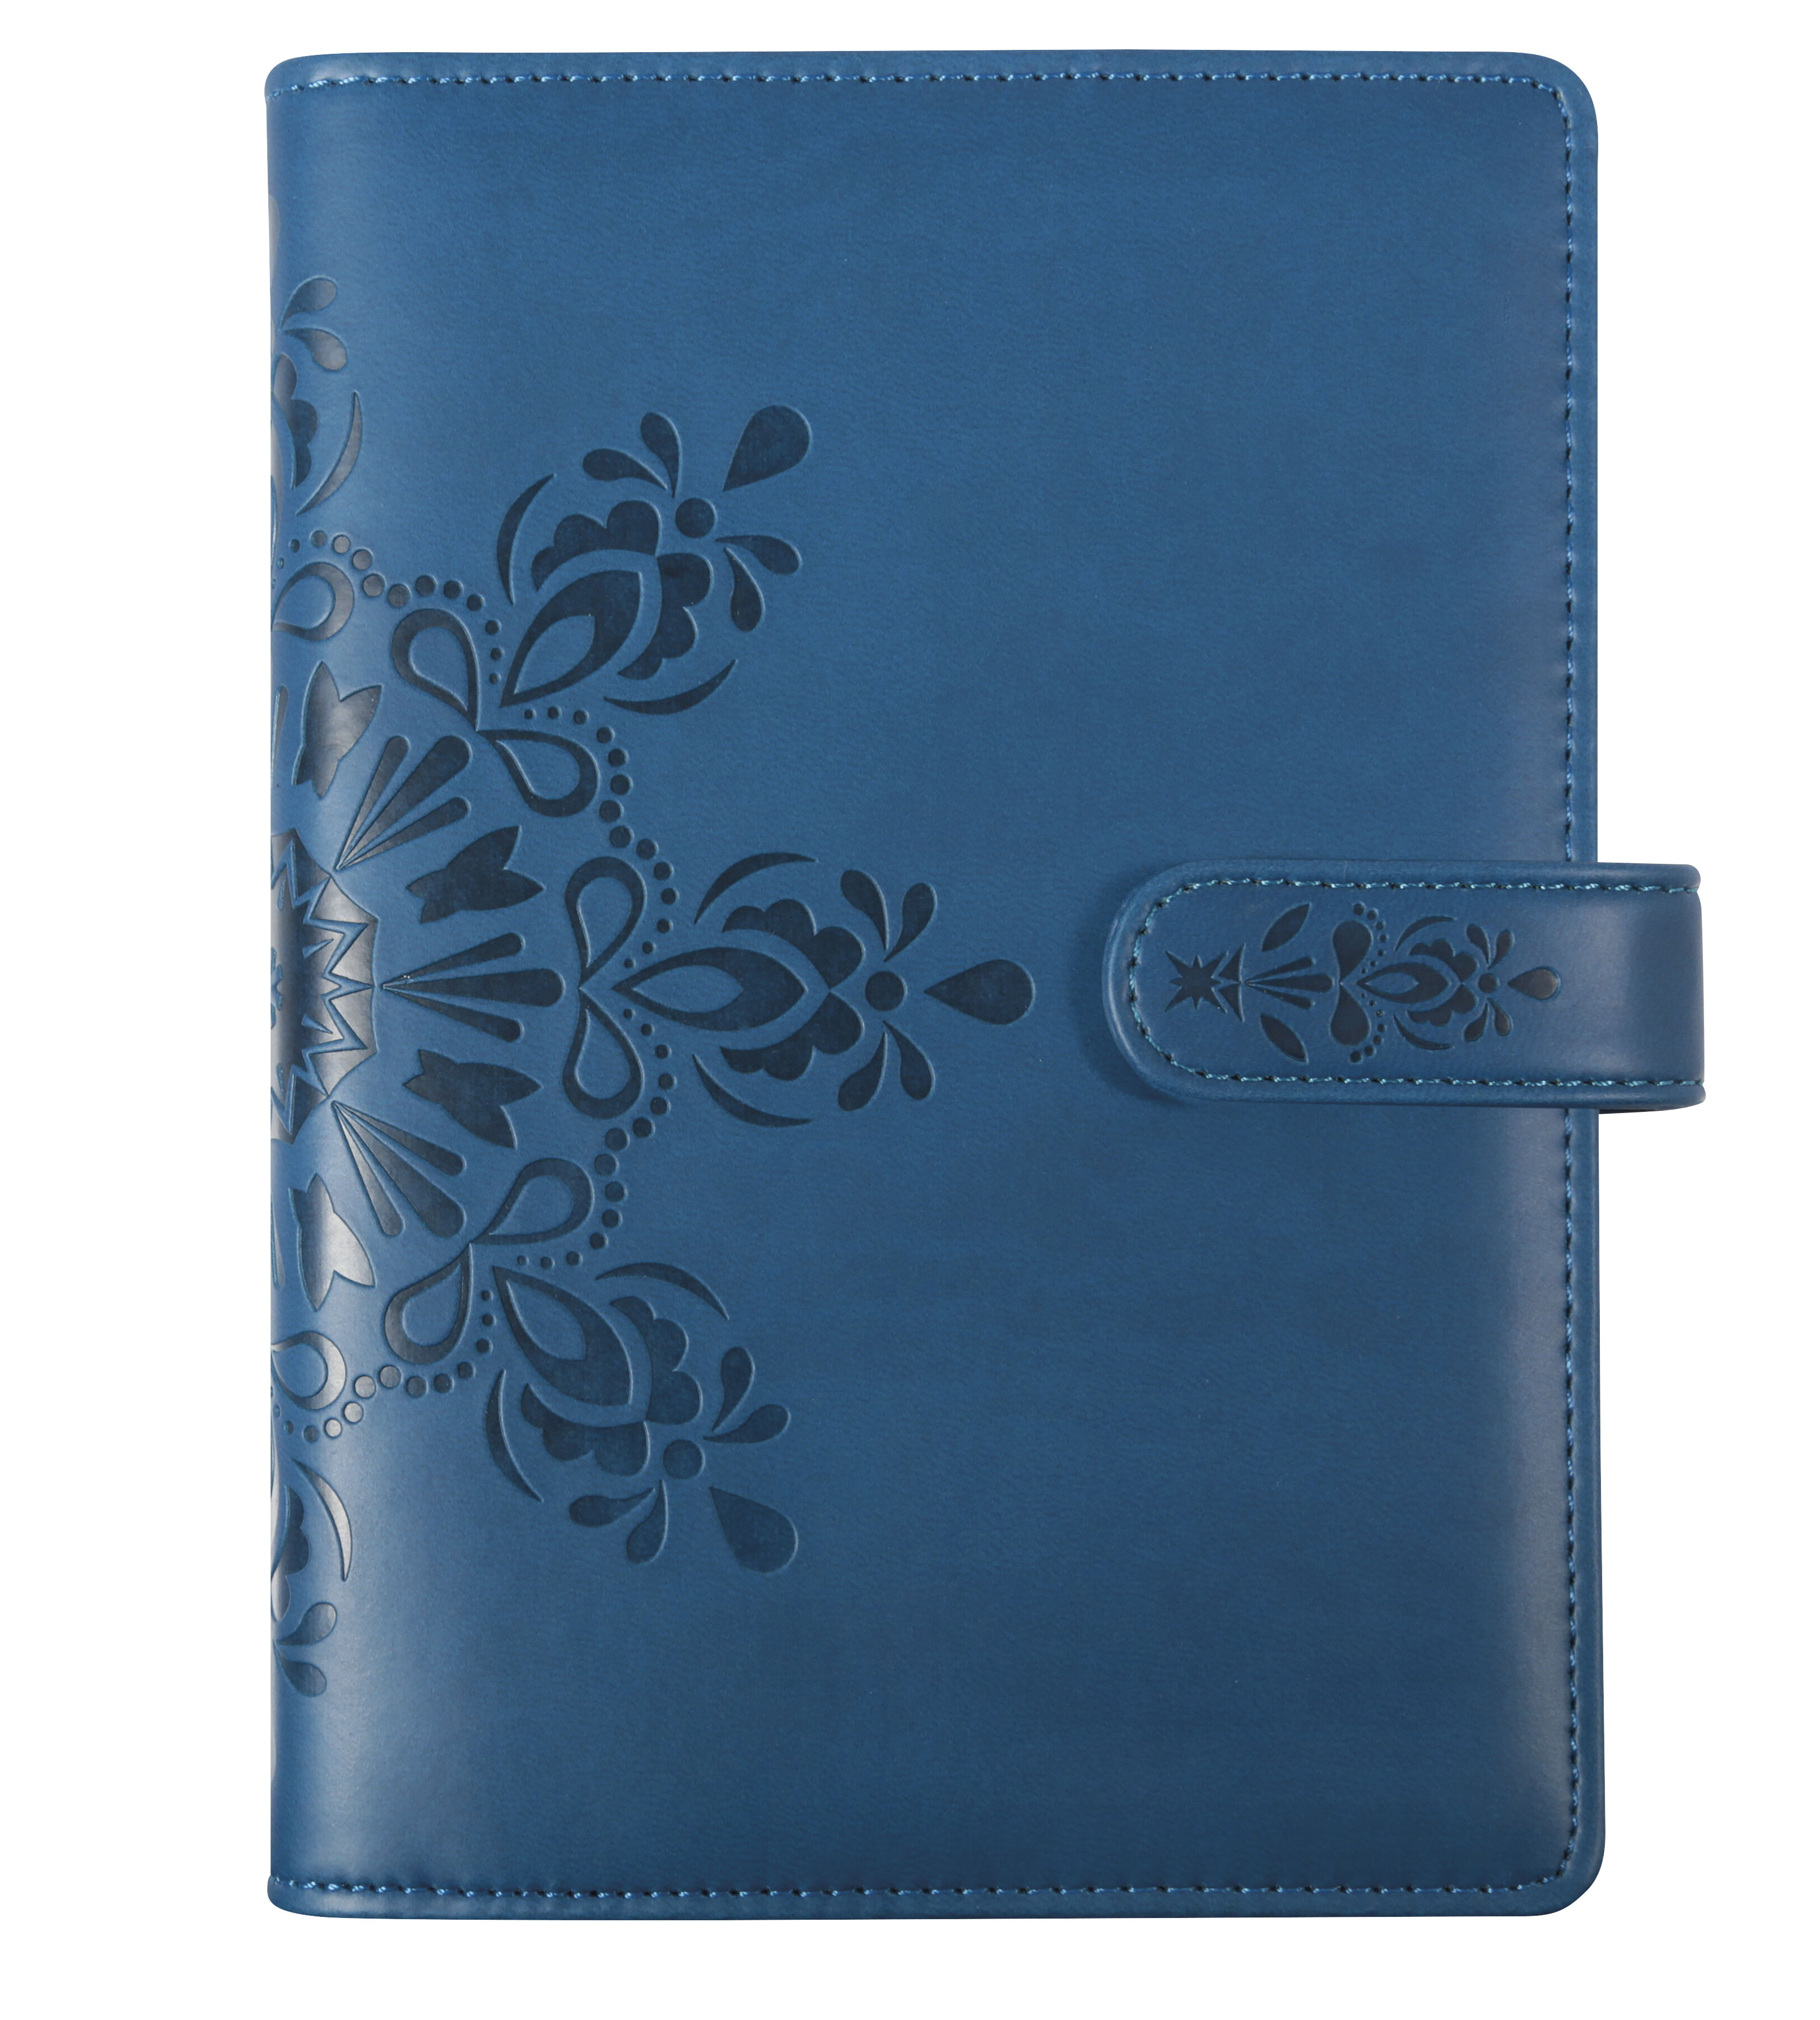 Cordoba - Organiseur 16 mois - 14 x 19 cm - bleu ciel - Exacompta